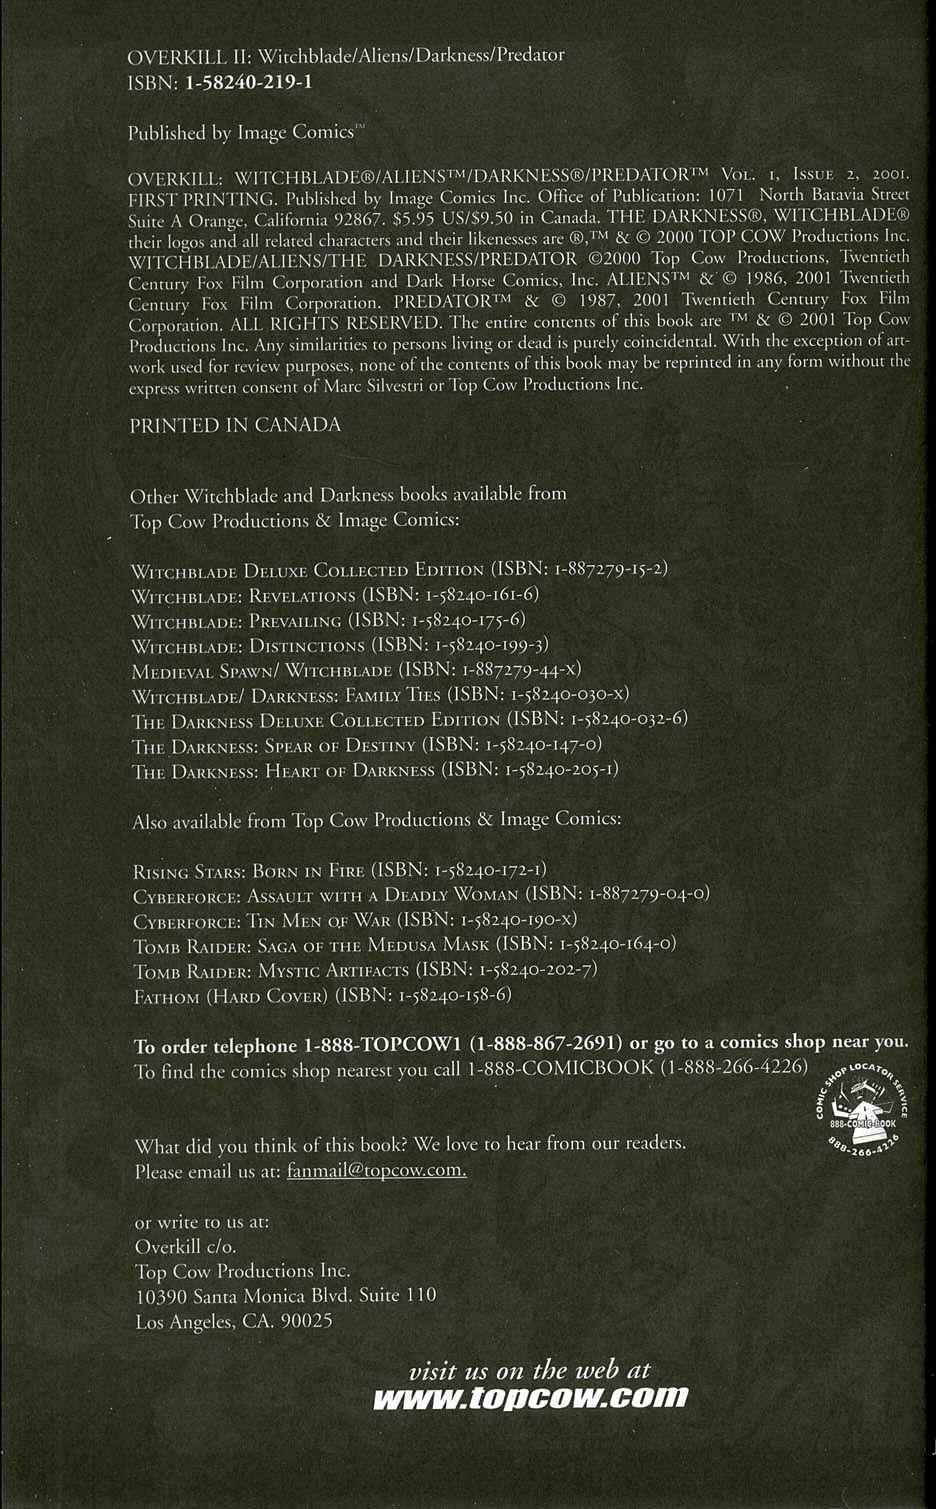 Read online Overkill: Witchblade/Aliens/Darkness/Predator comic -  Issue #2 - 2